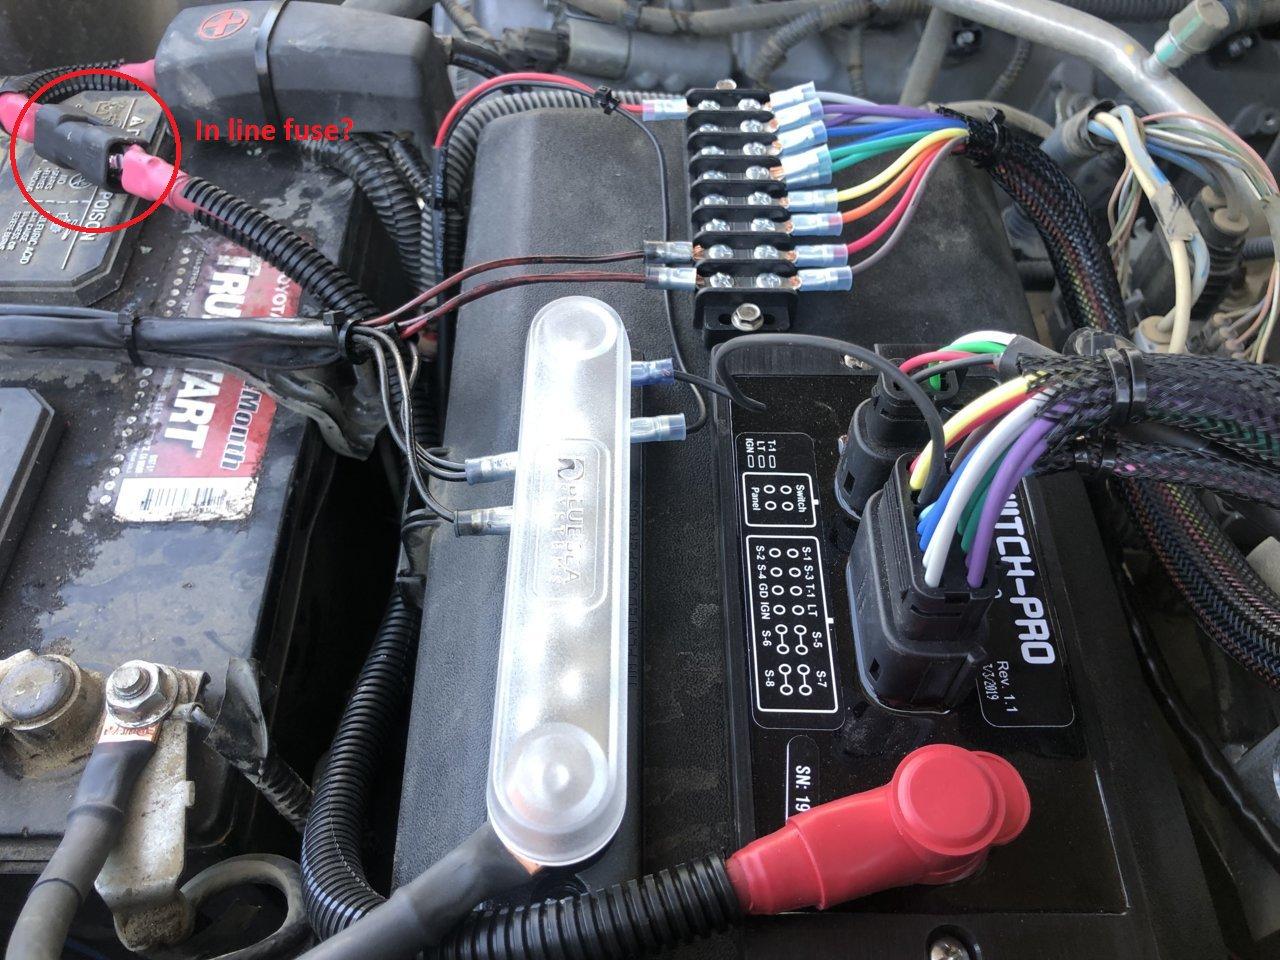 sw-9100 fuse.jpg